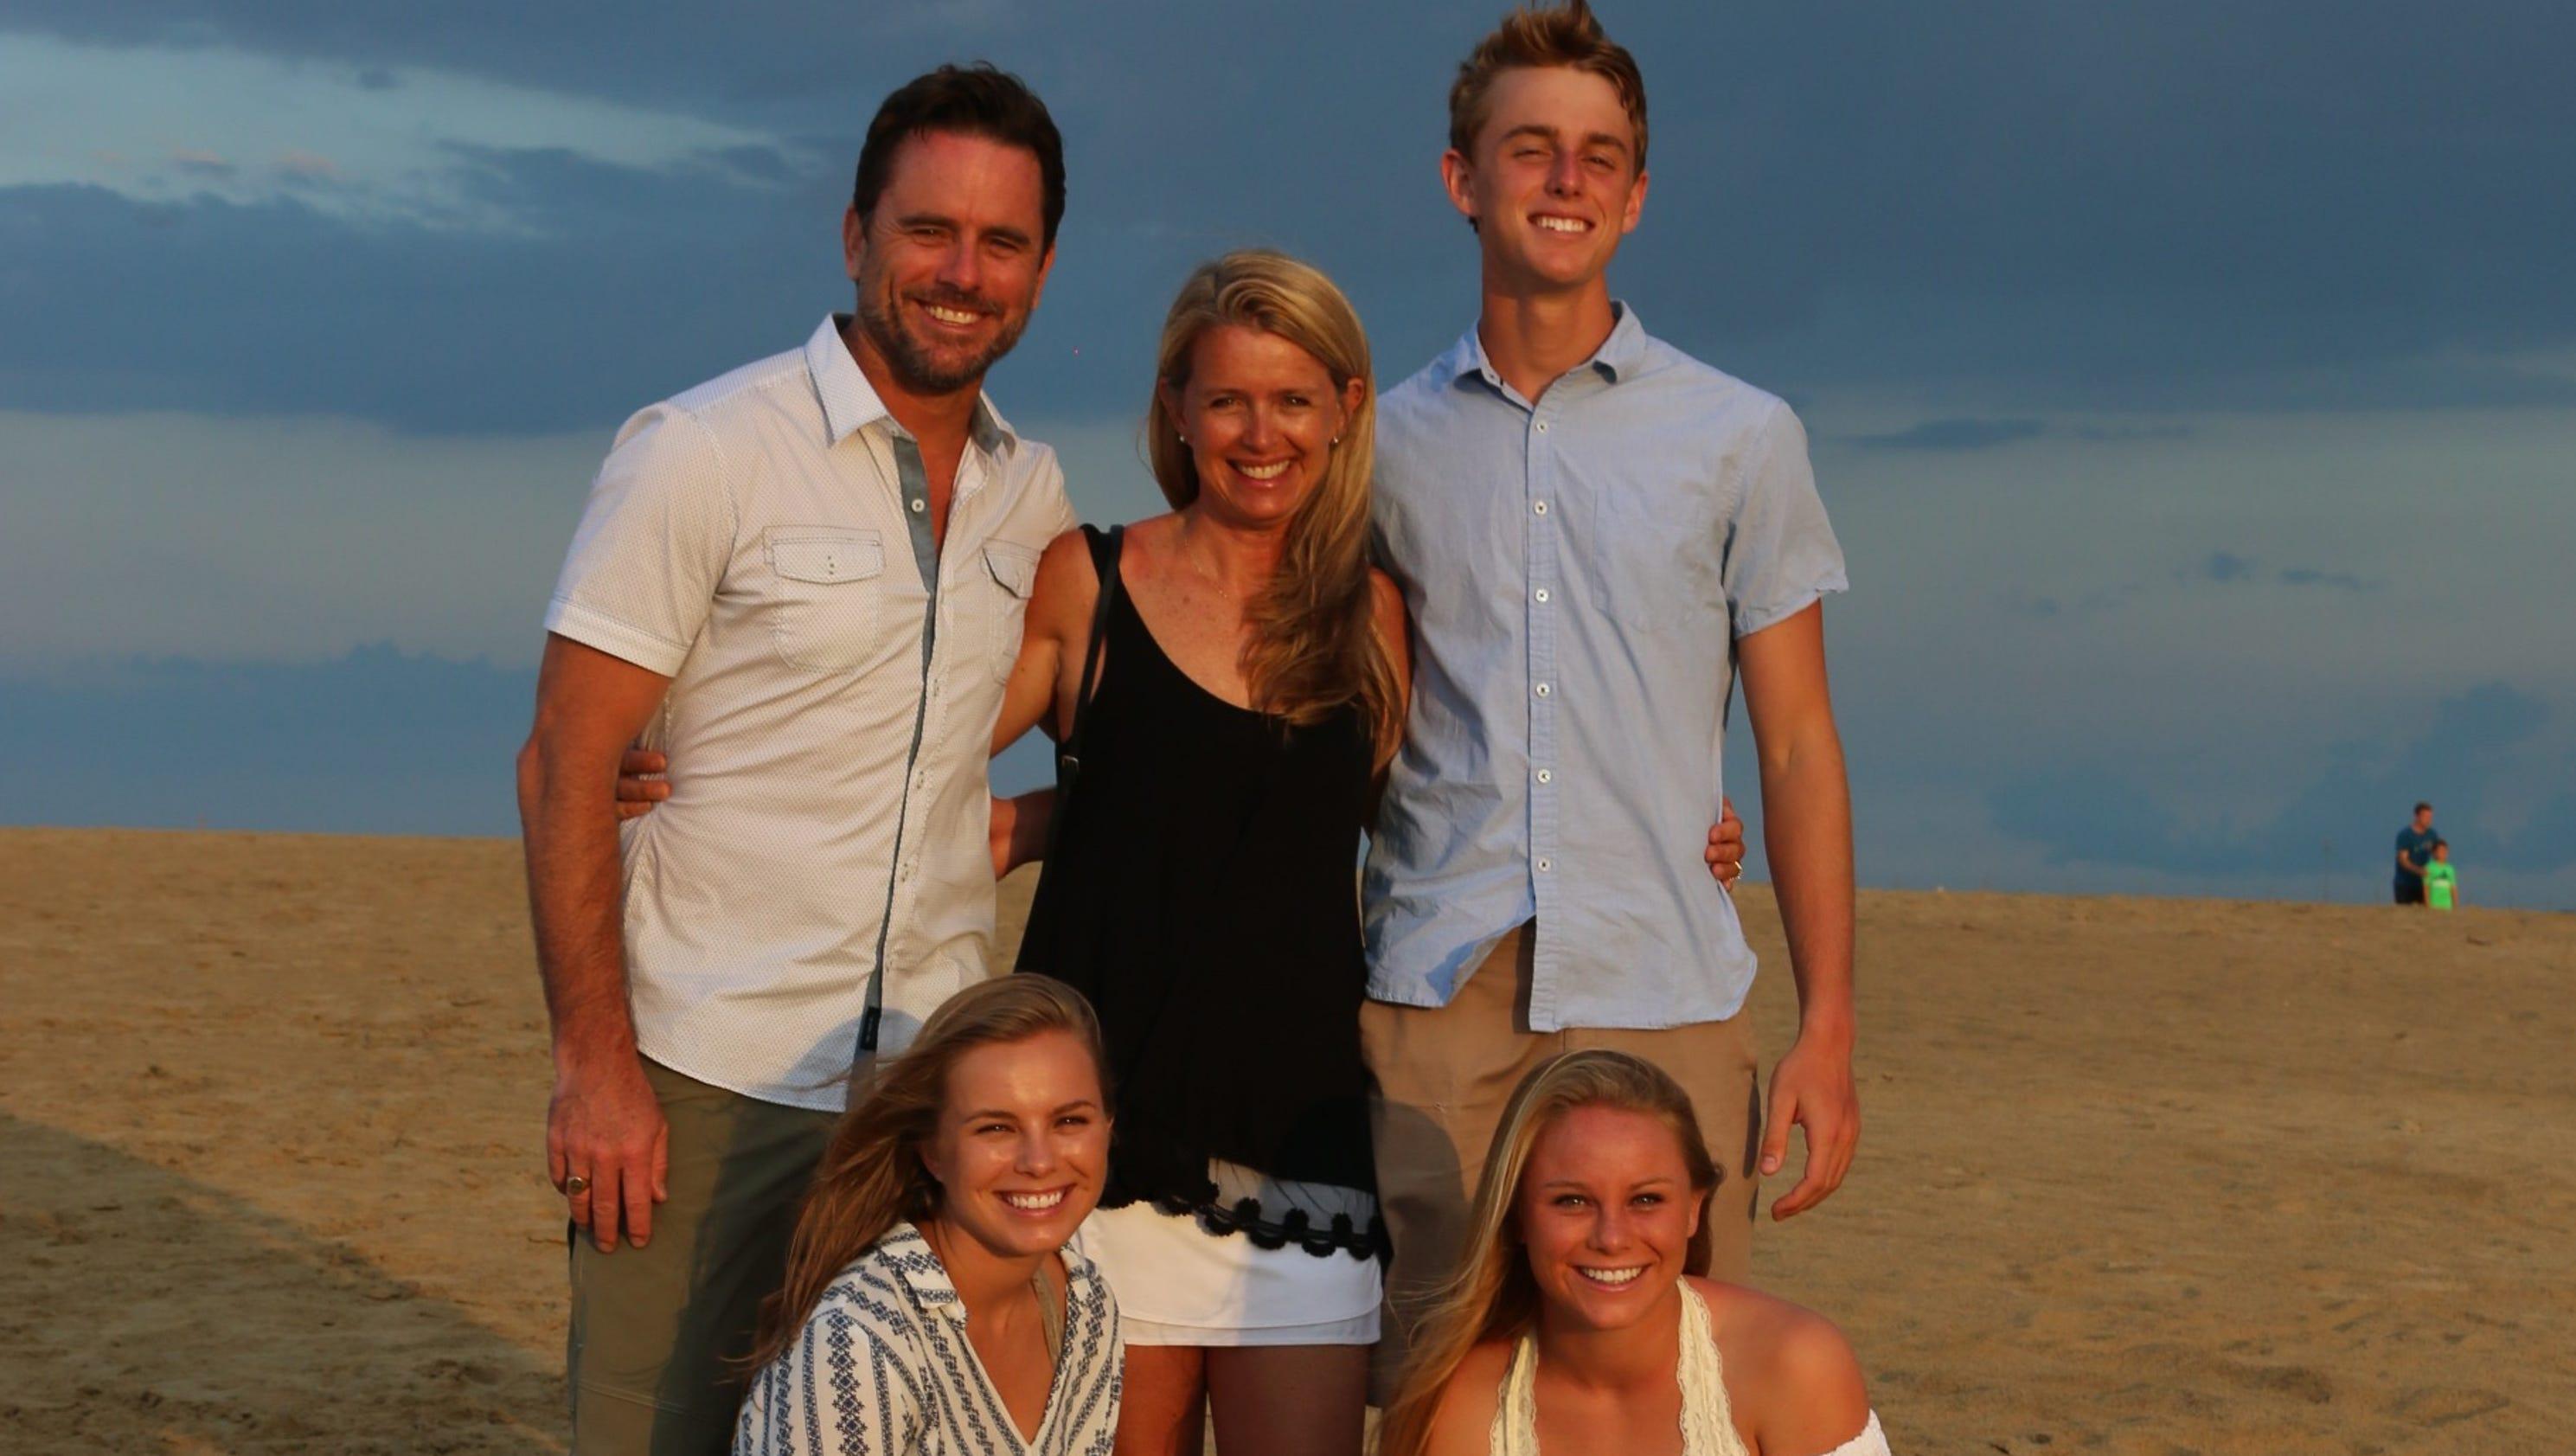 Chip Esten daughter's battle with cancer